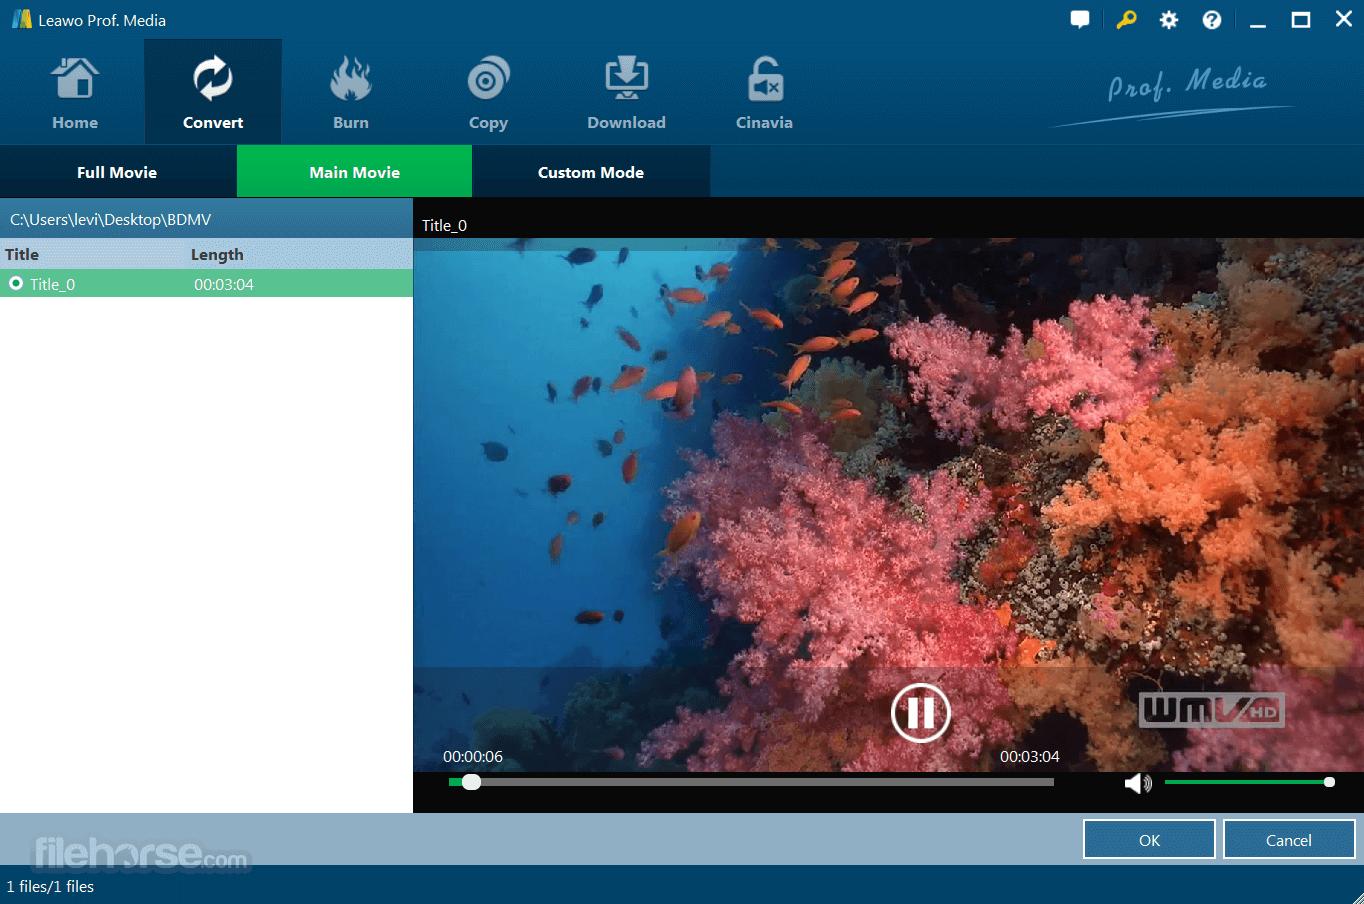 Leawo Blu-ray Ripper 8.3.0.0 Screenshot 3